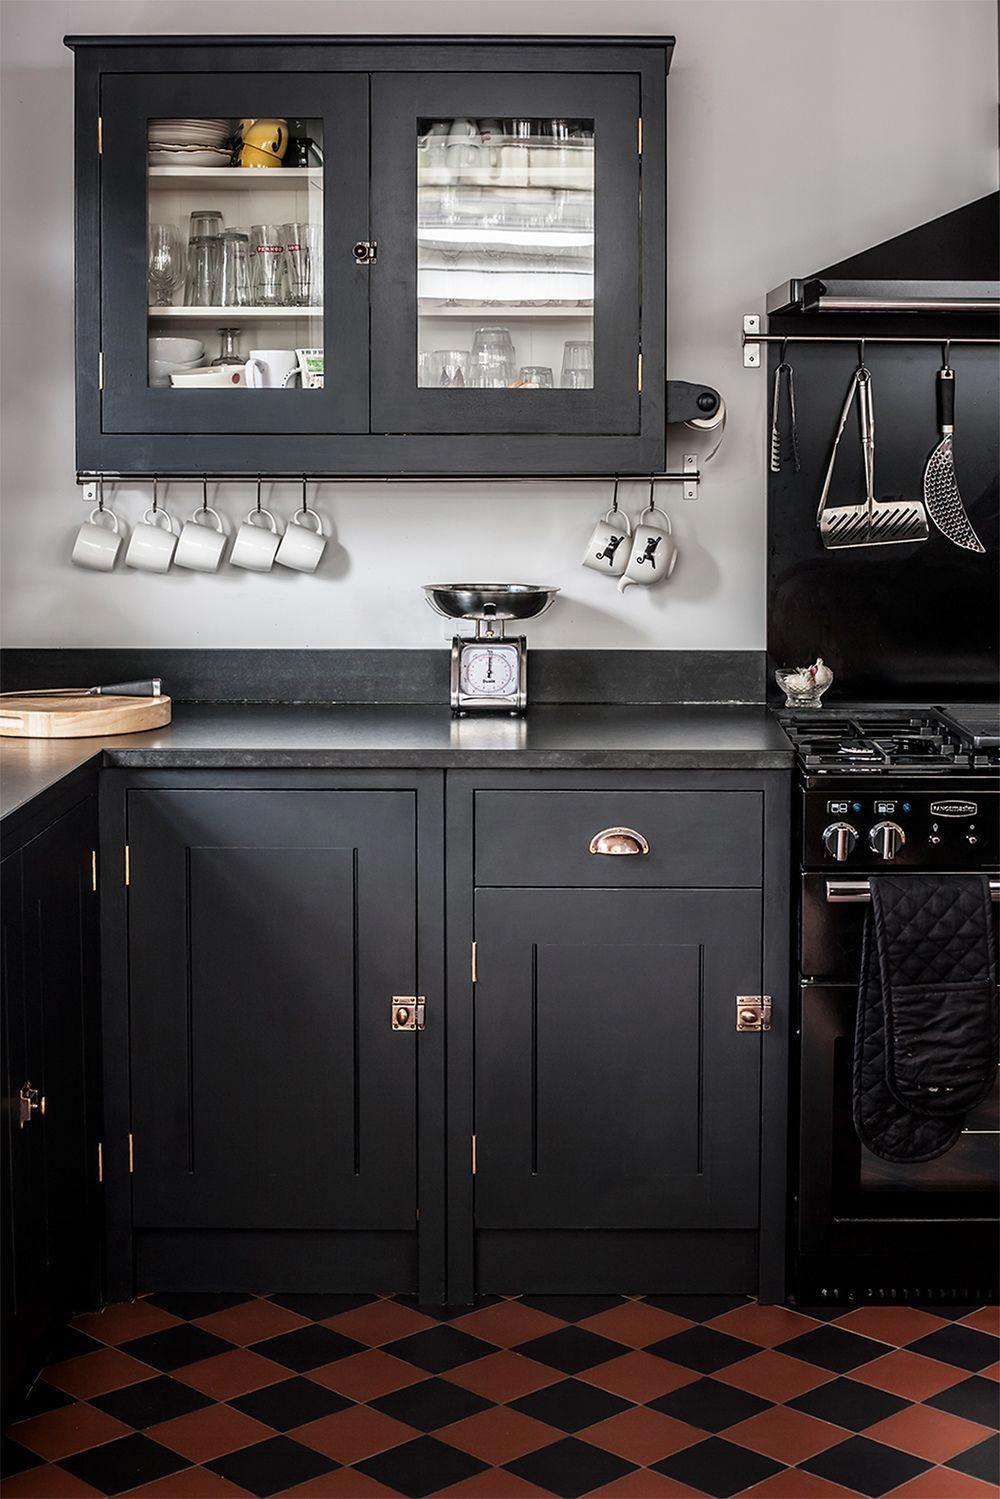 Kitchen Makeover part 2 The Big Reveal! Black kitchens